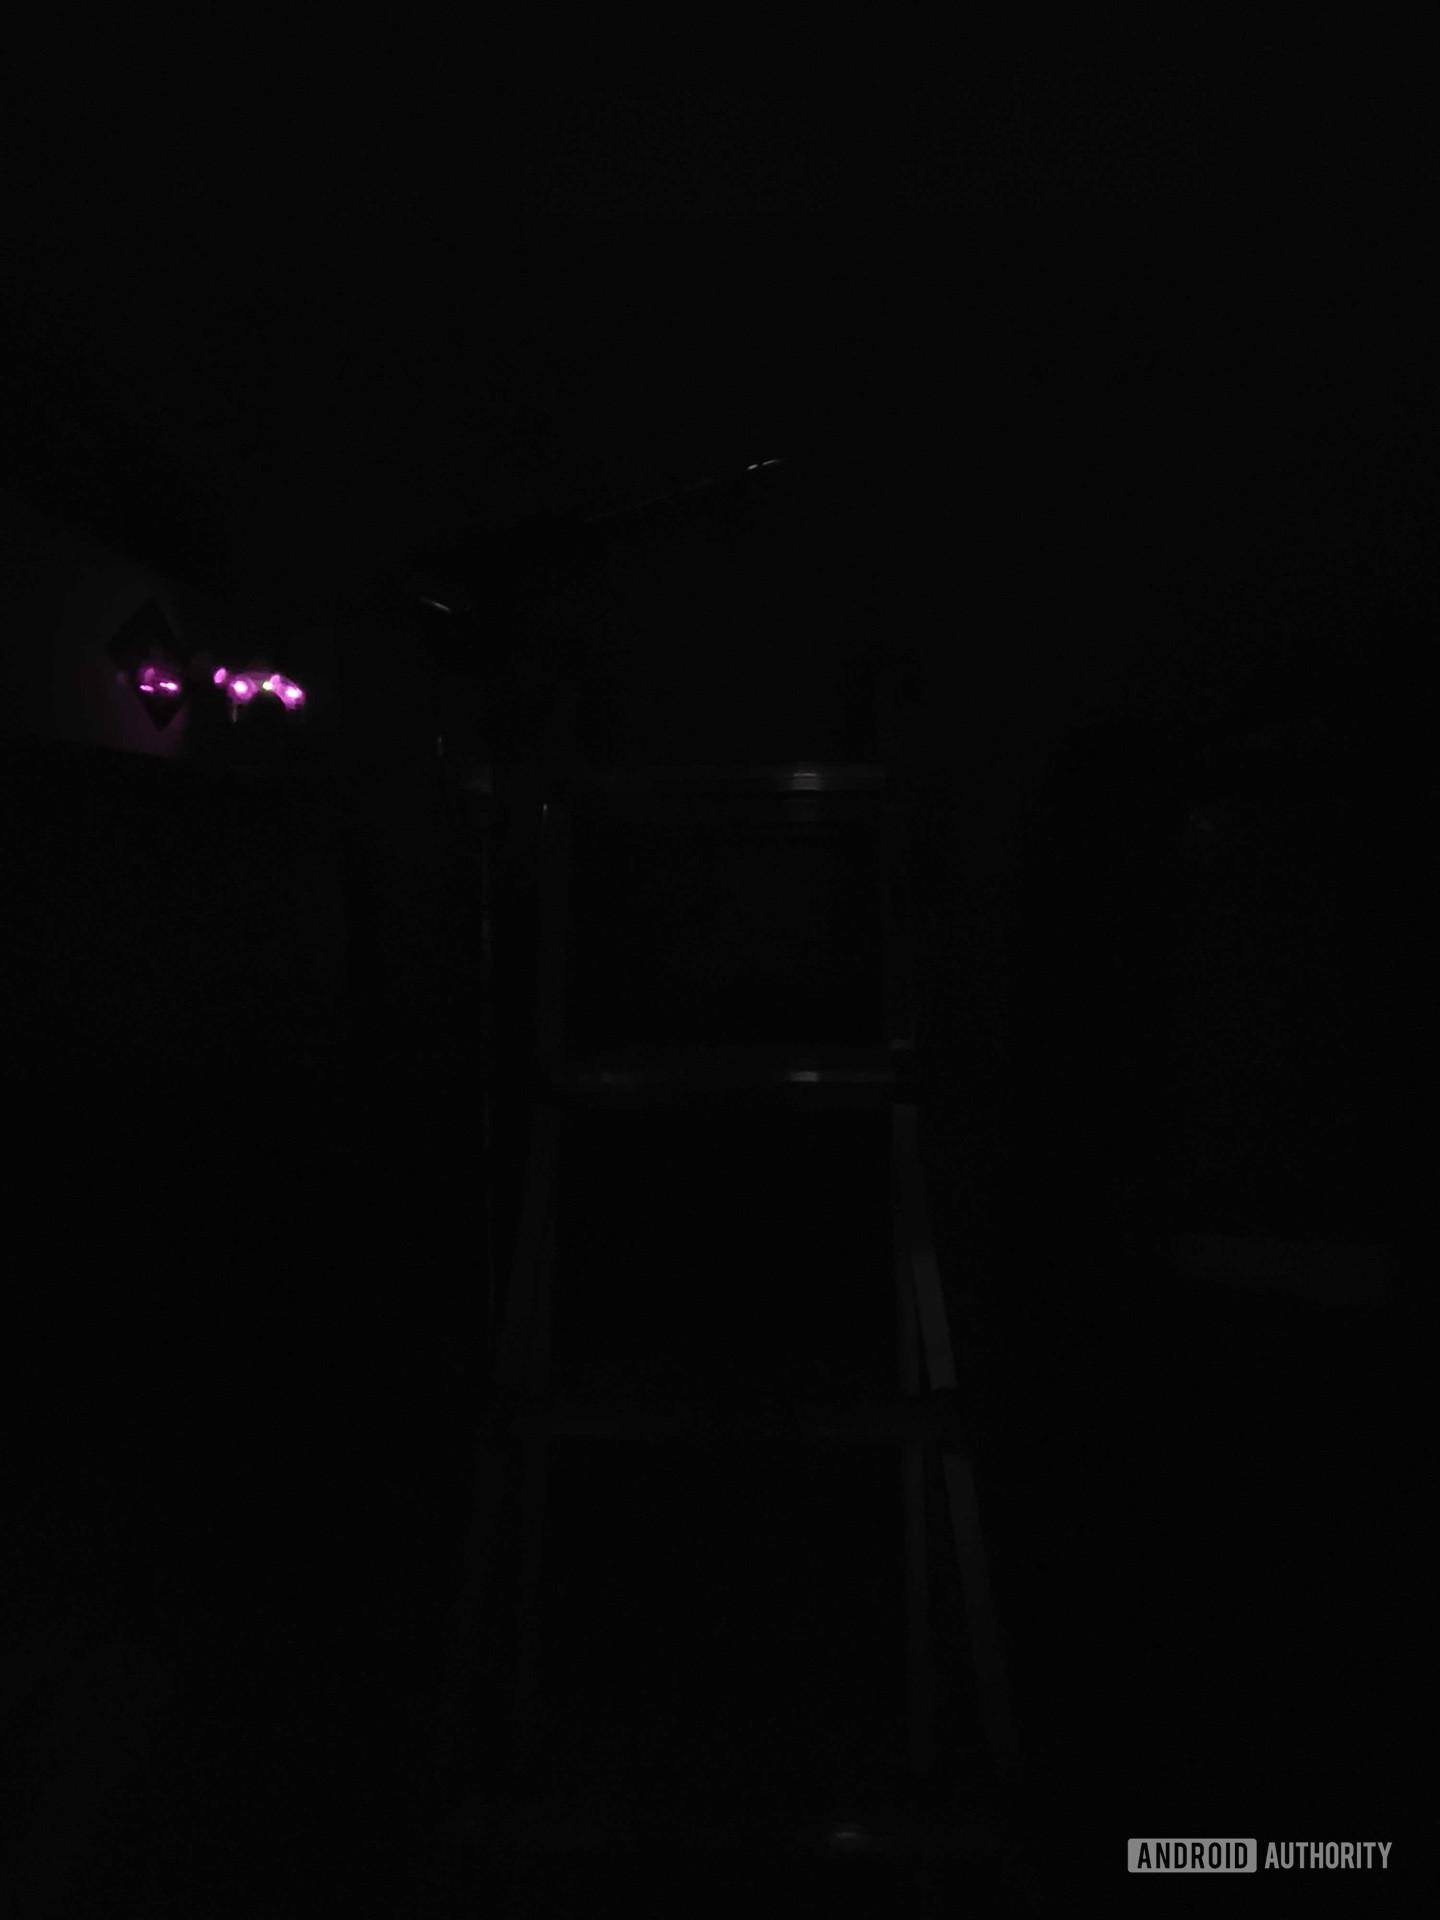 Samung Galaxy S20 Ultra photo sample no nightmode 1